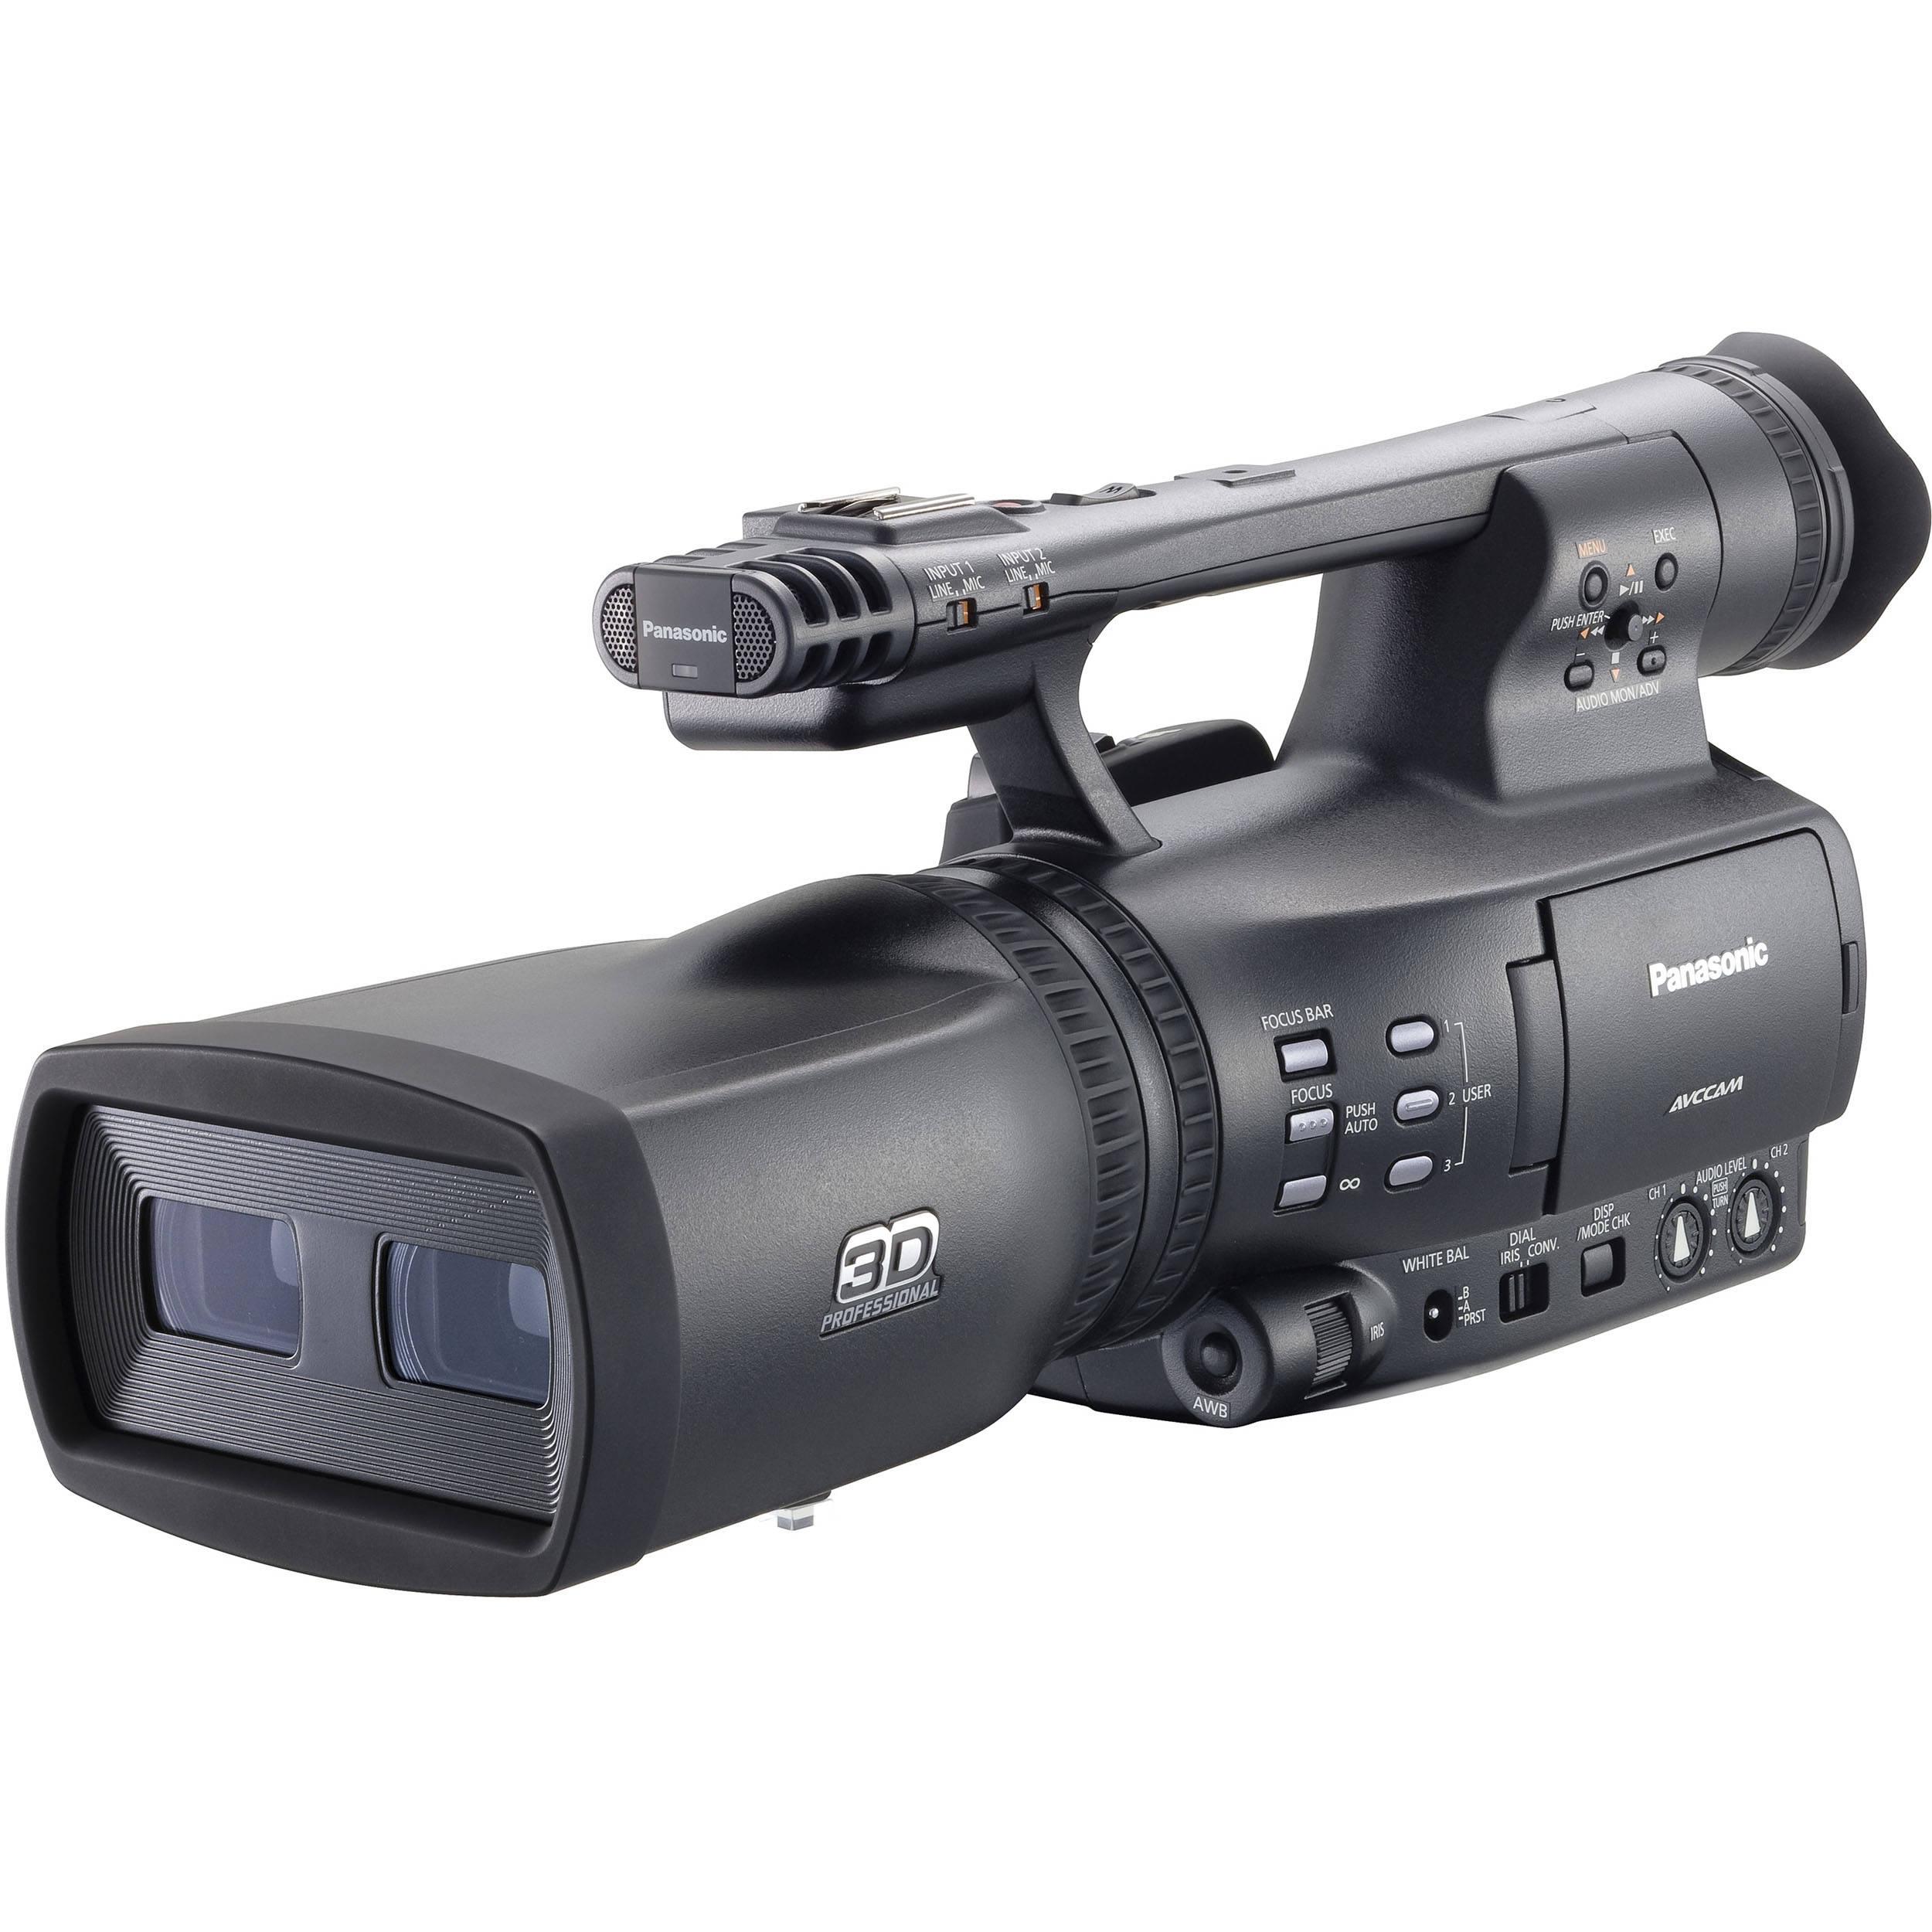 3D xxx ag3 pics pornos film